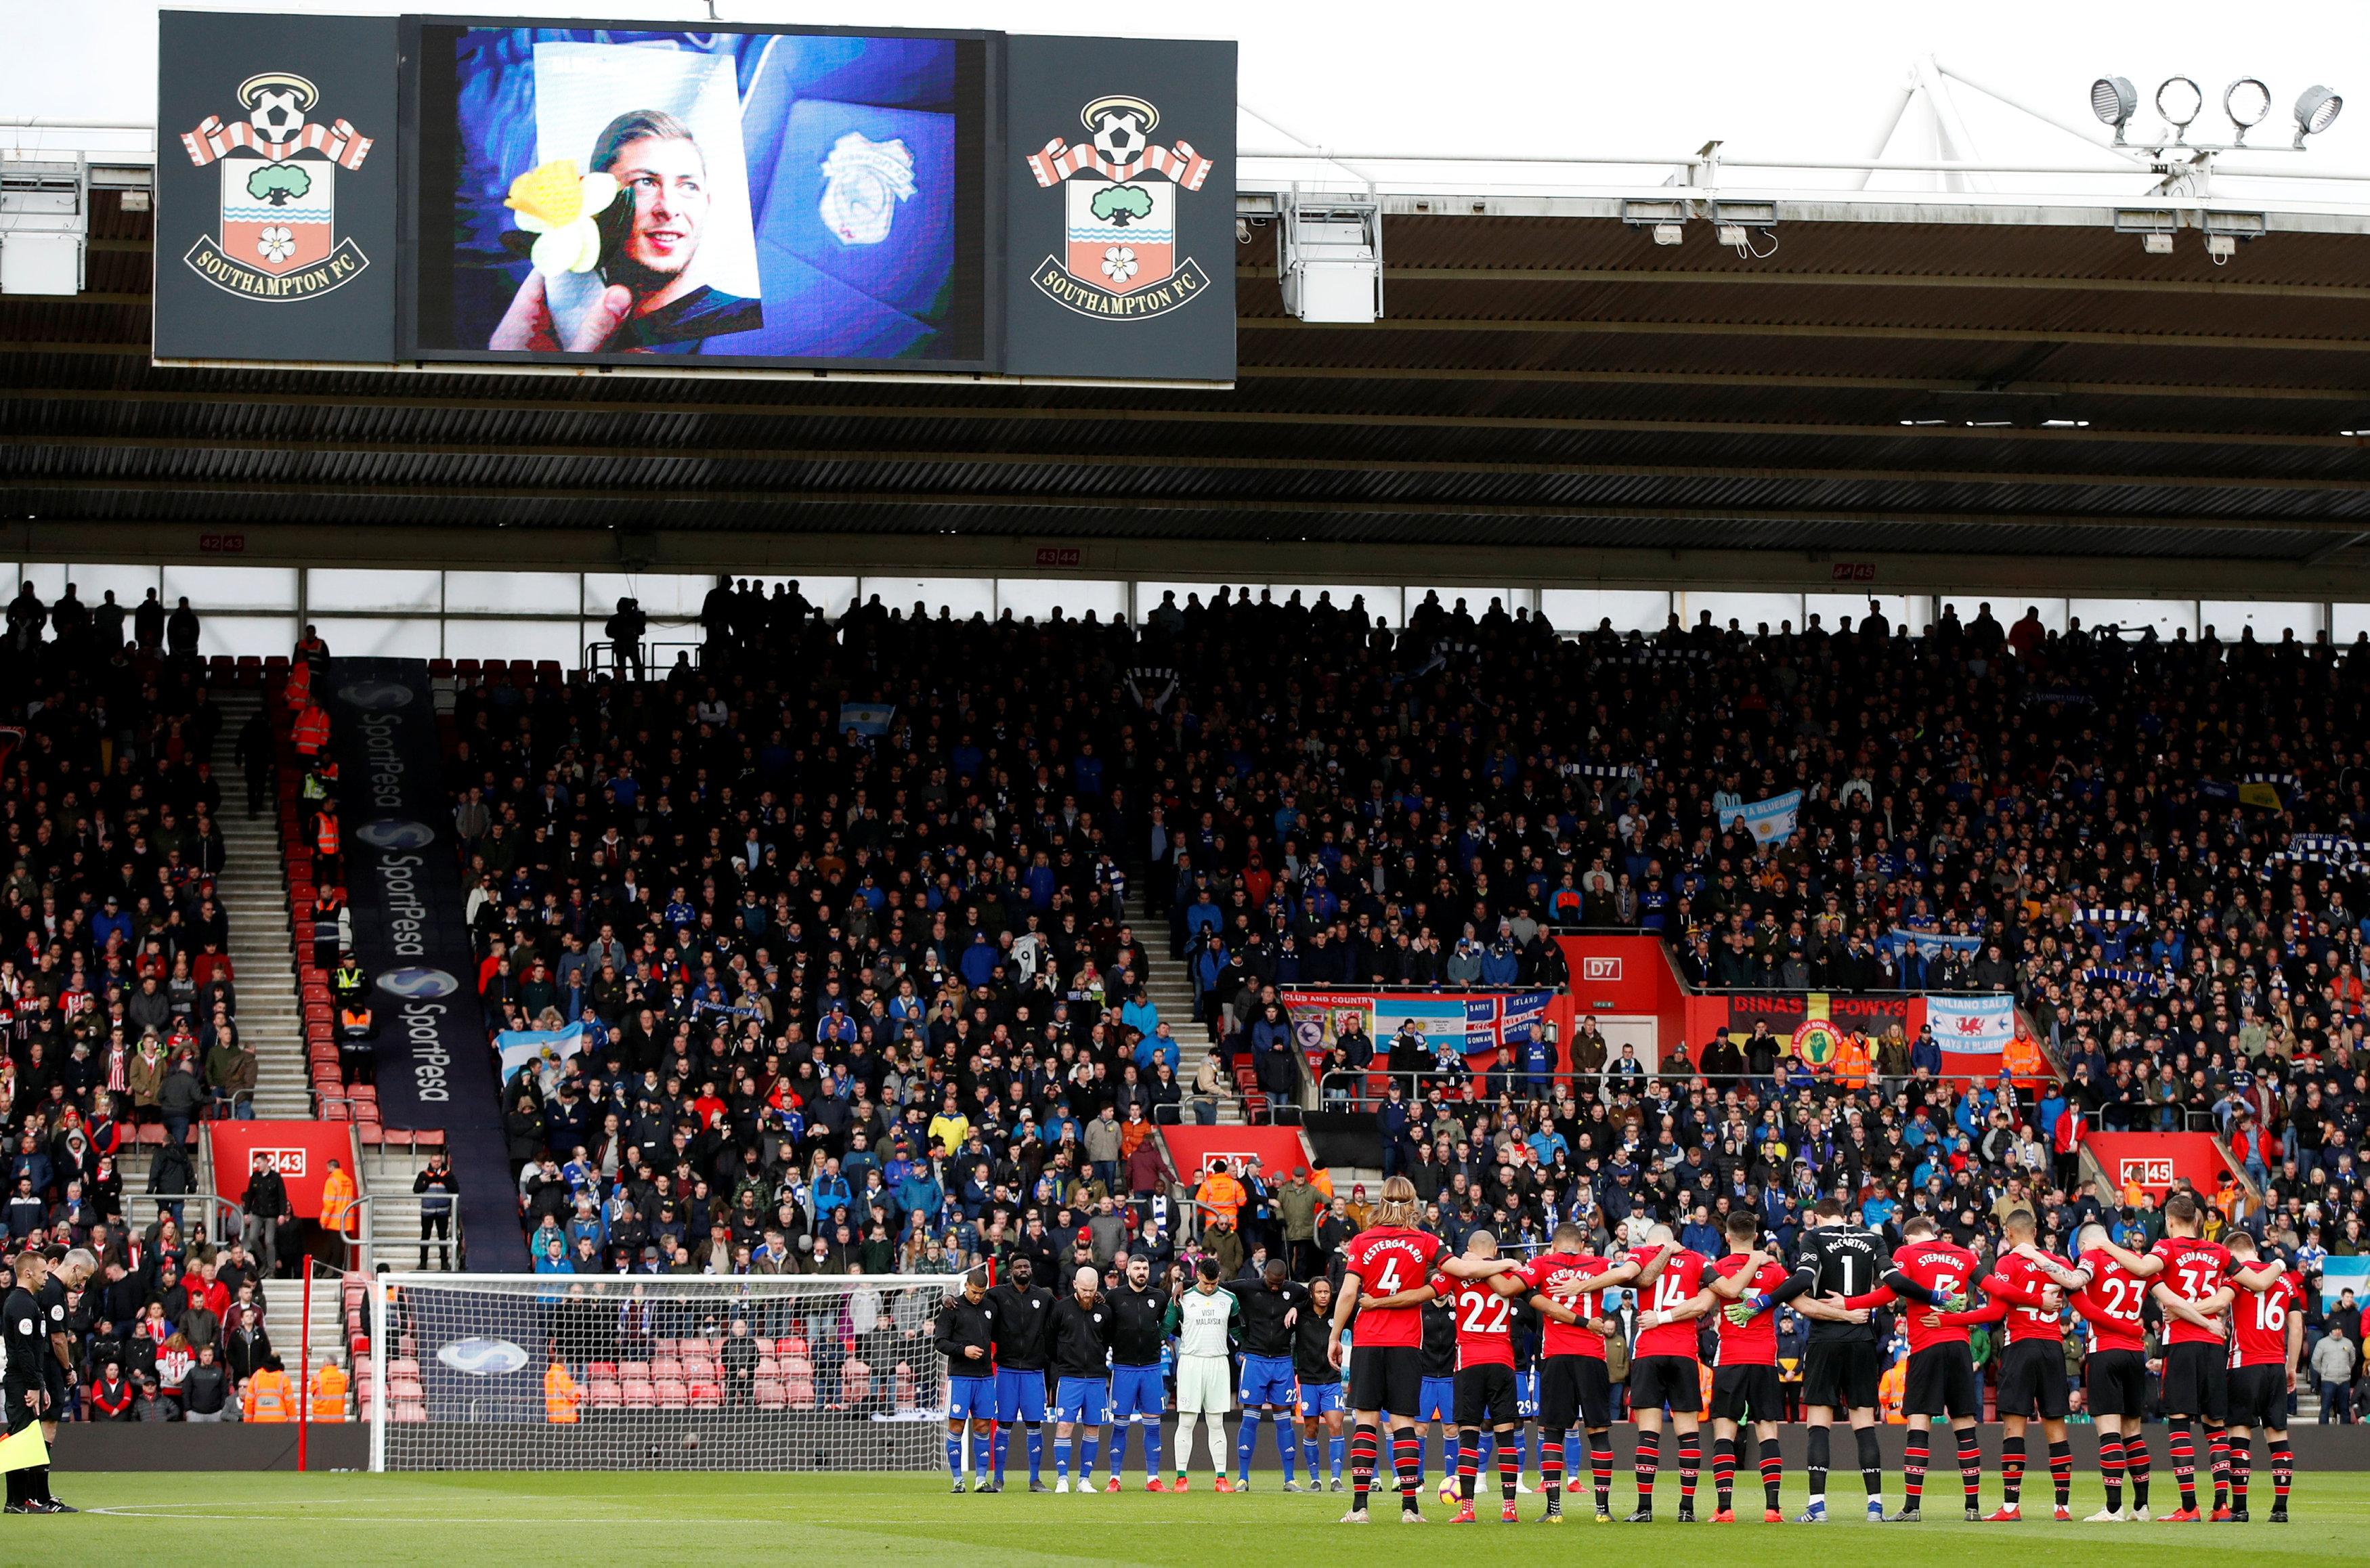 Football - Etranger - Disparition d'Emiliano Sala : l'émouvante minute de silence avant Southampton-Cardiff